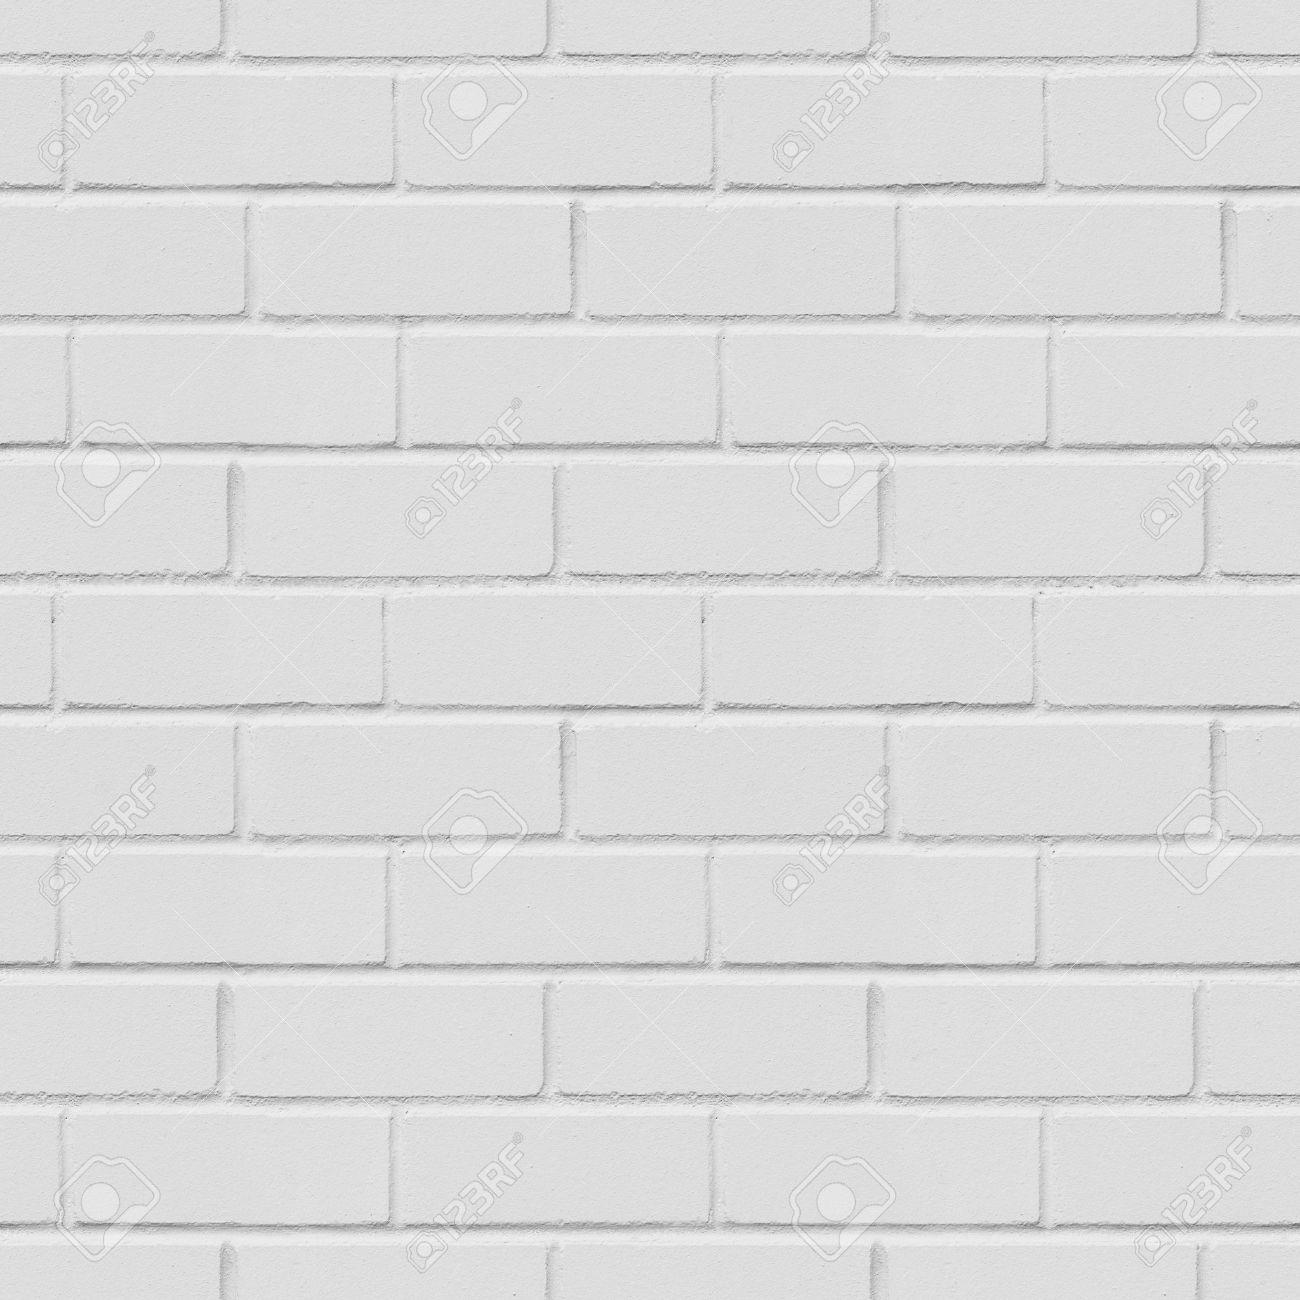 Seamless white brick wall background, texture Stock Photo - 42104117